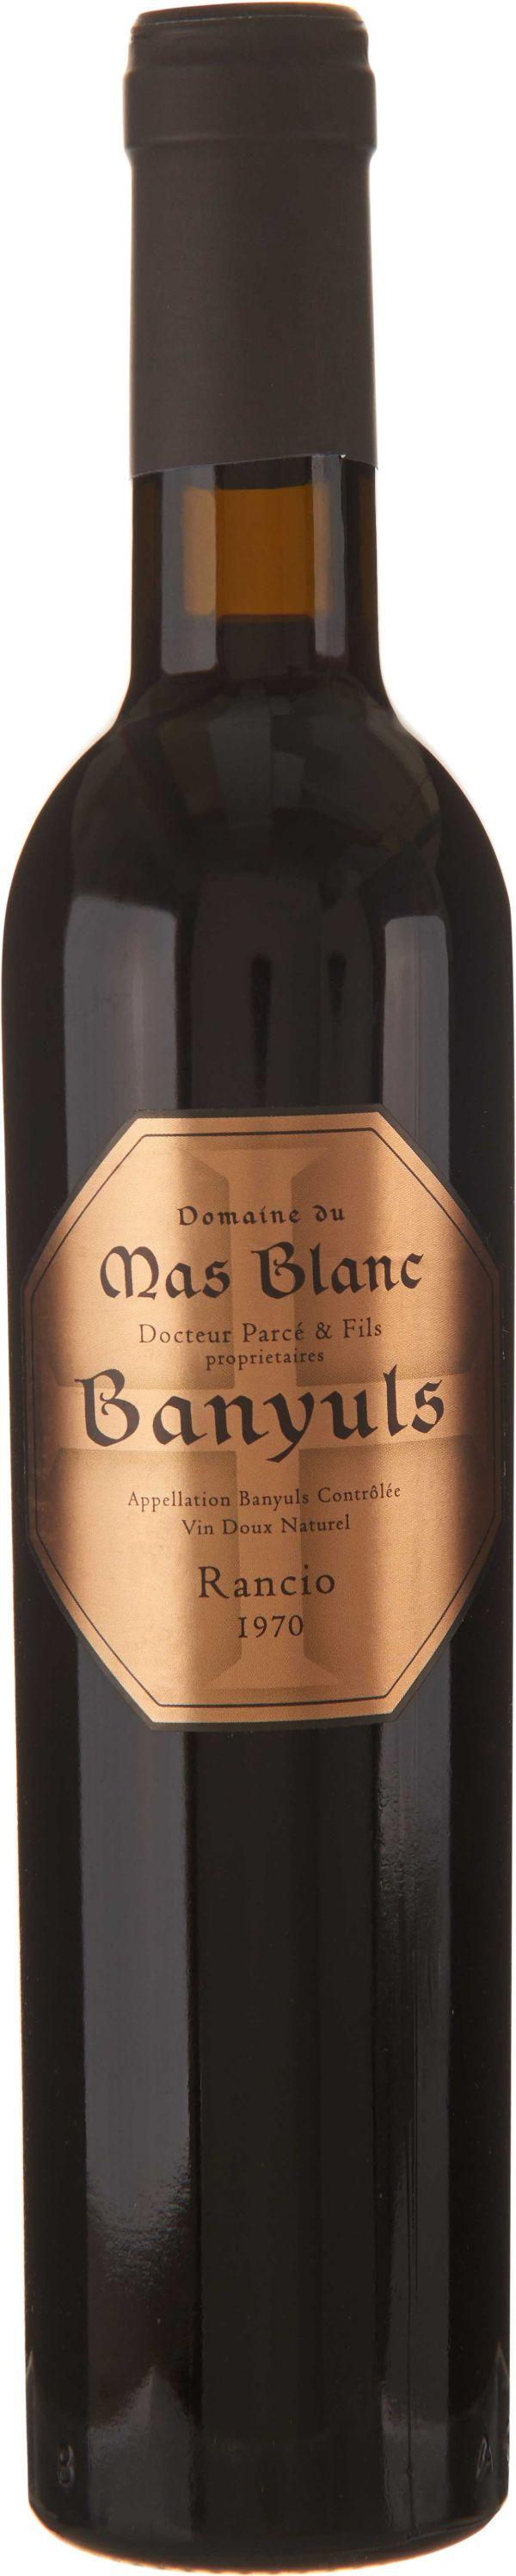 Domaine du Mas Blanc Banyuls Rancio Sec 1970